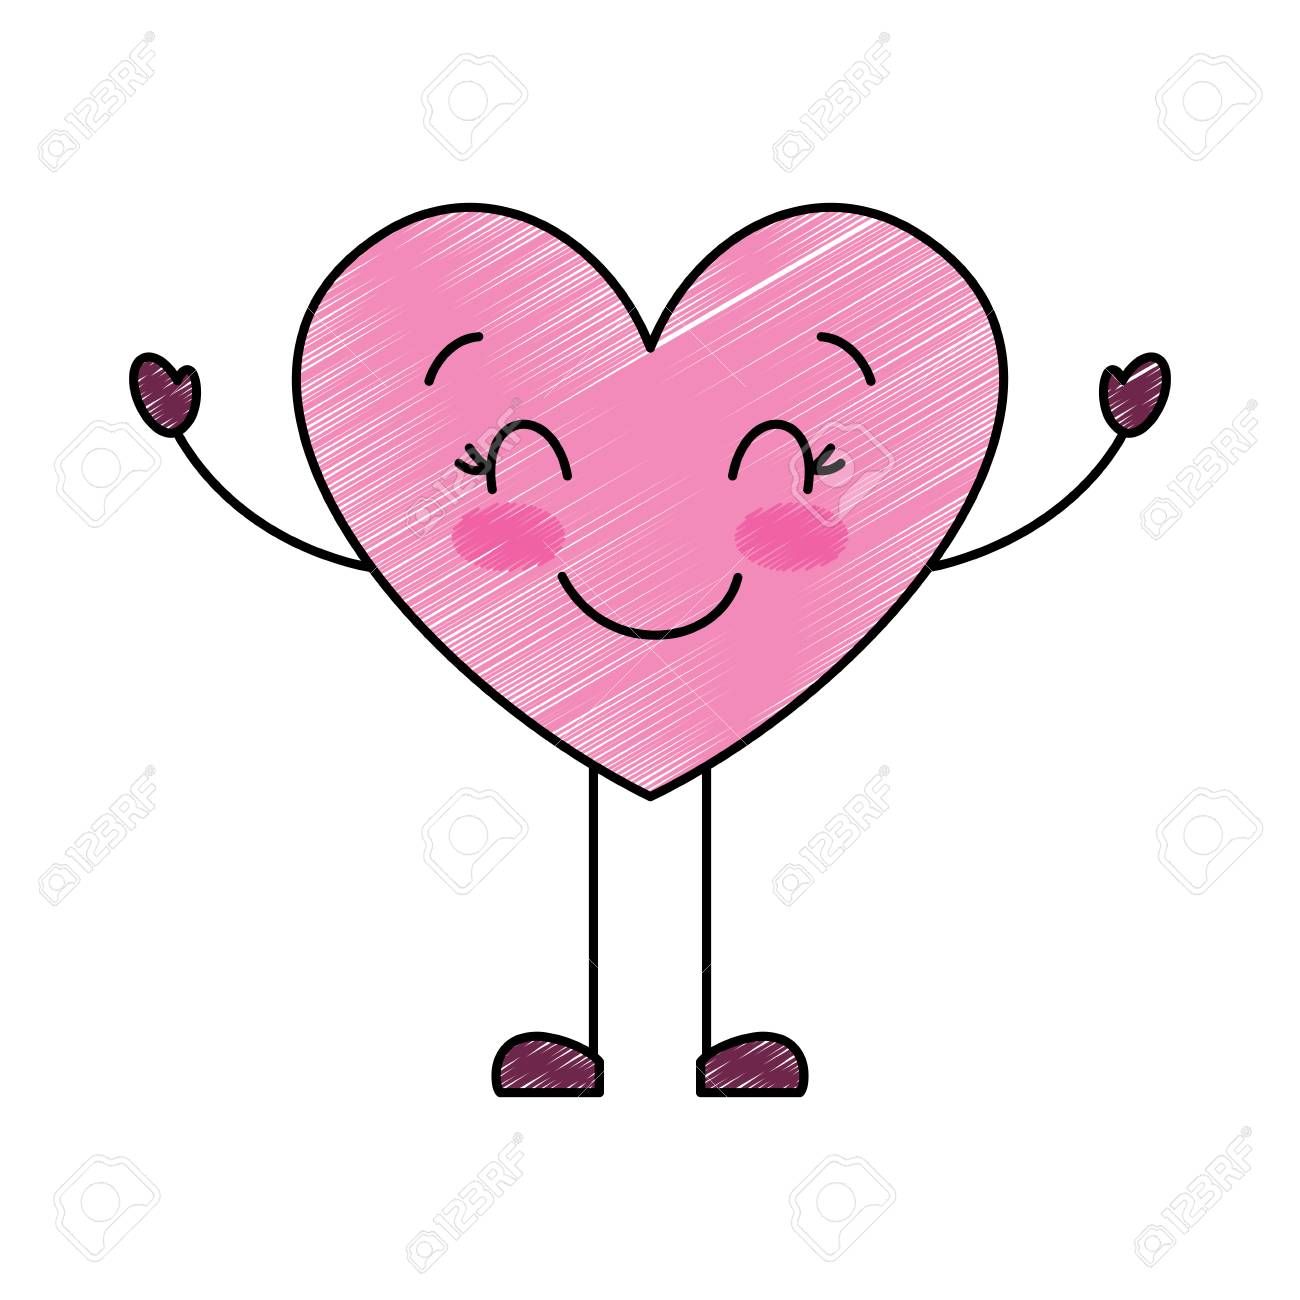 Cute Cartoon Heart Happy Character Vector Illustration Drawing Royalty Free Cliparts Vectors And Stock Illustration Image 95755482